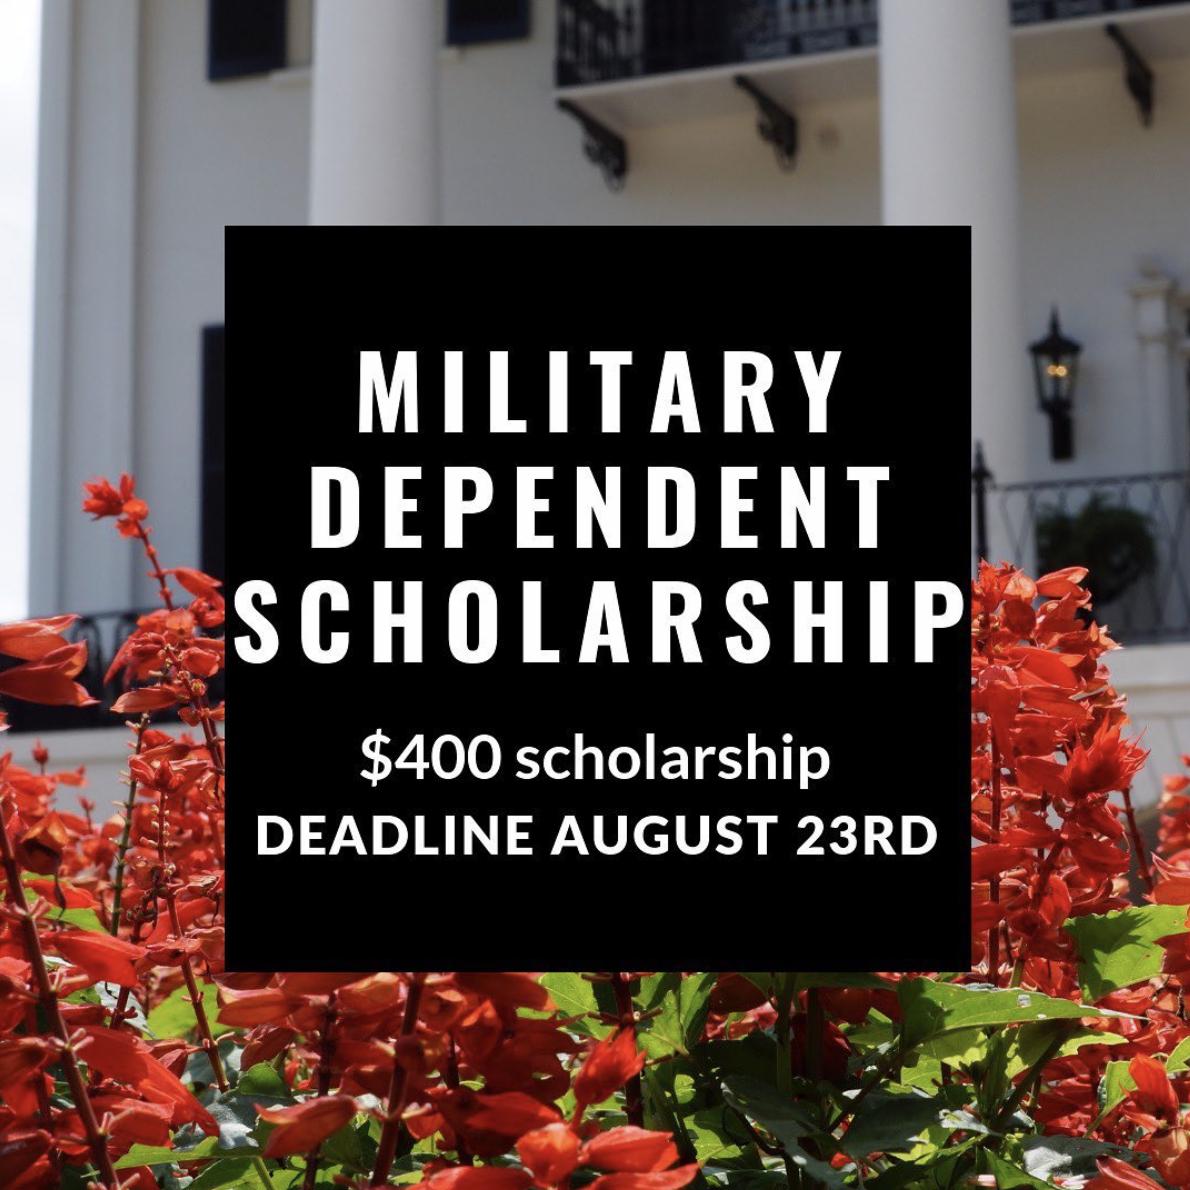 Military Dependent Scholarship